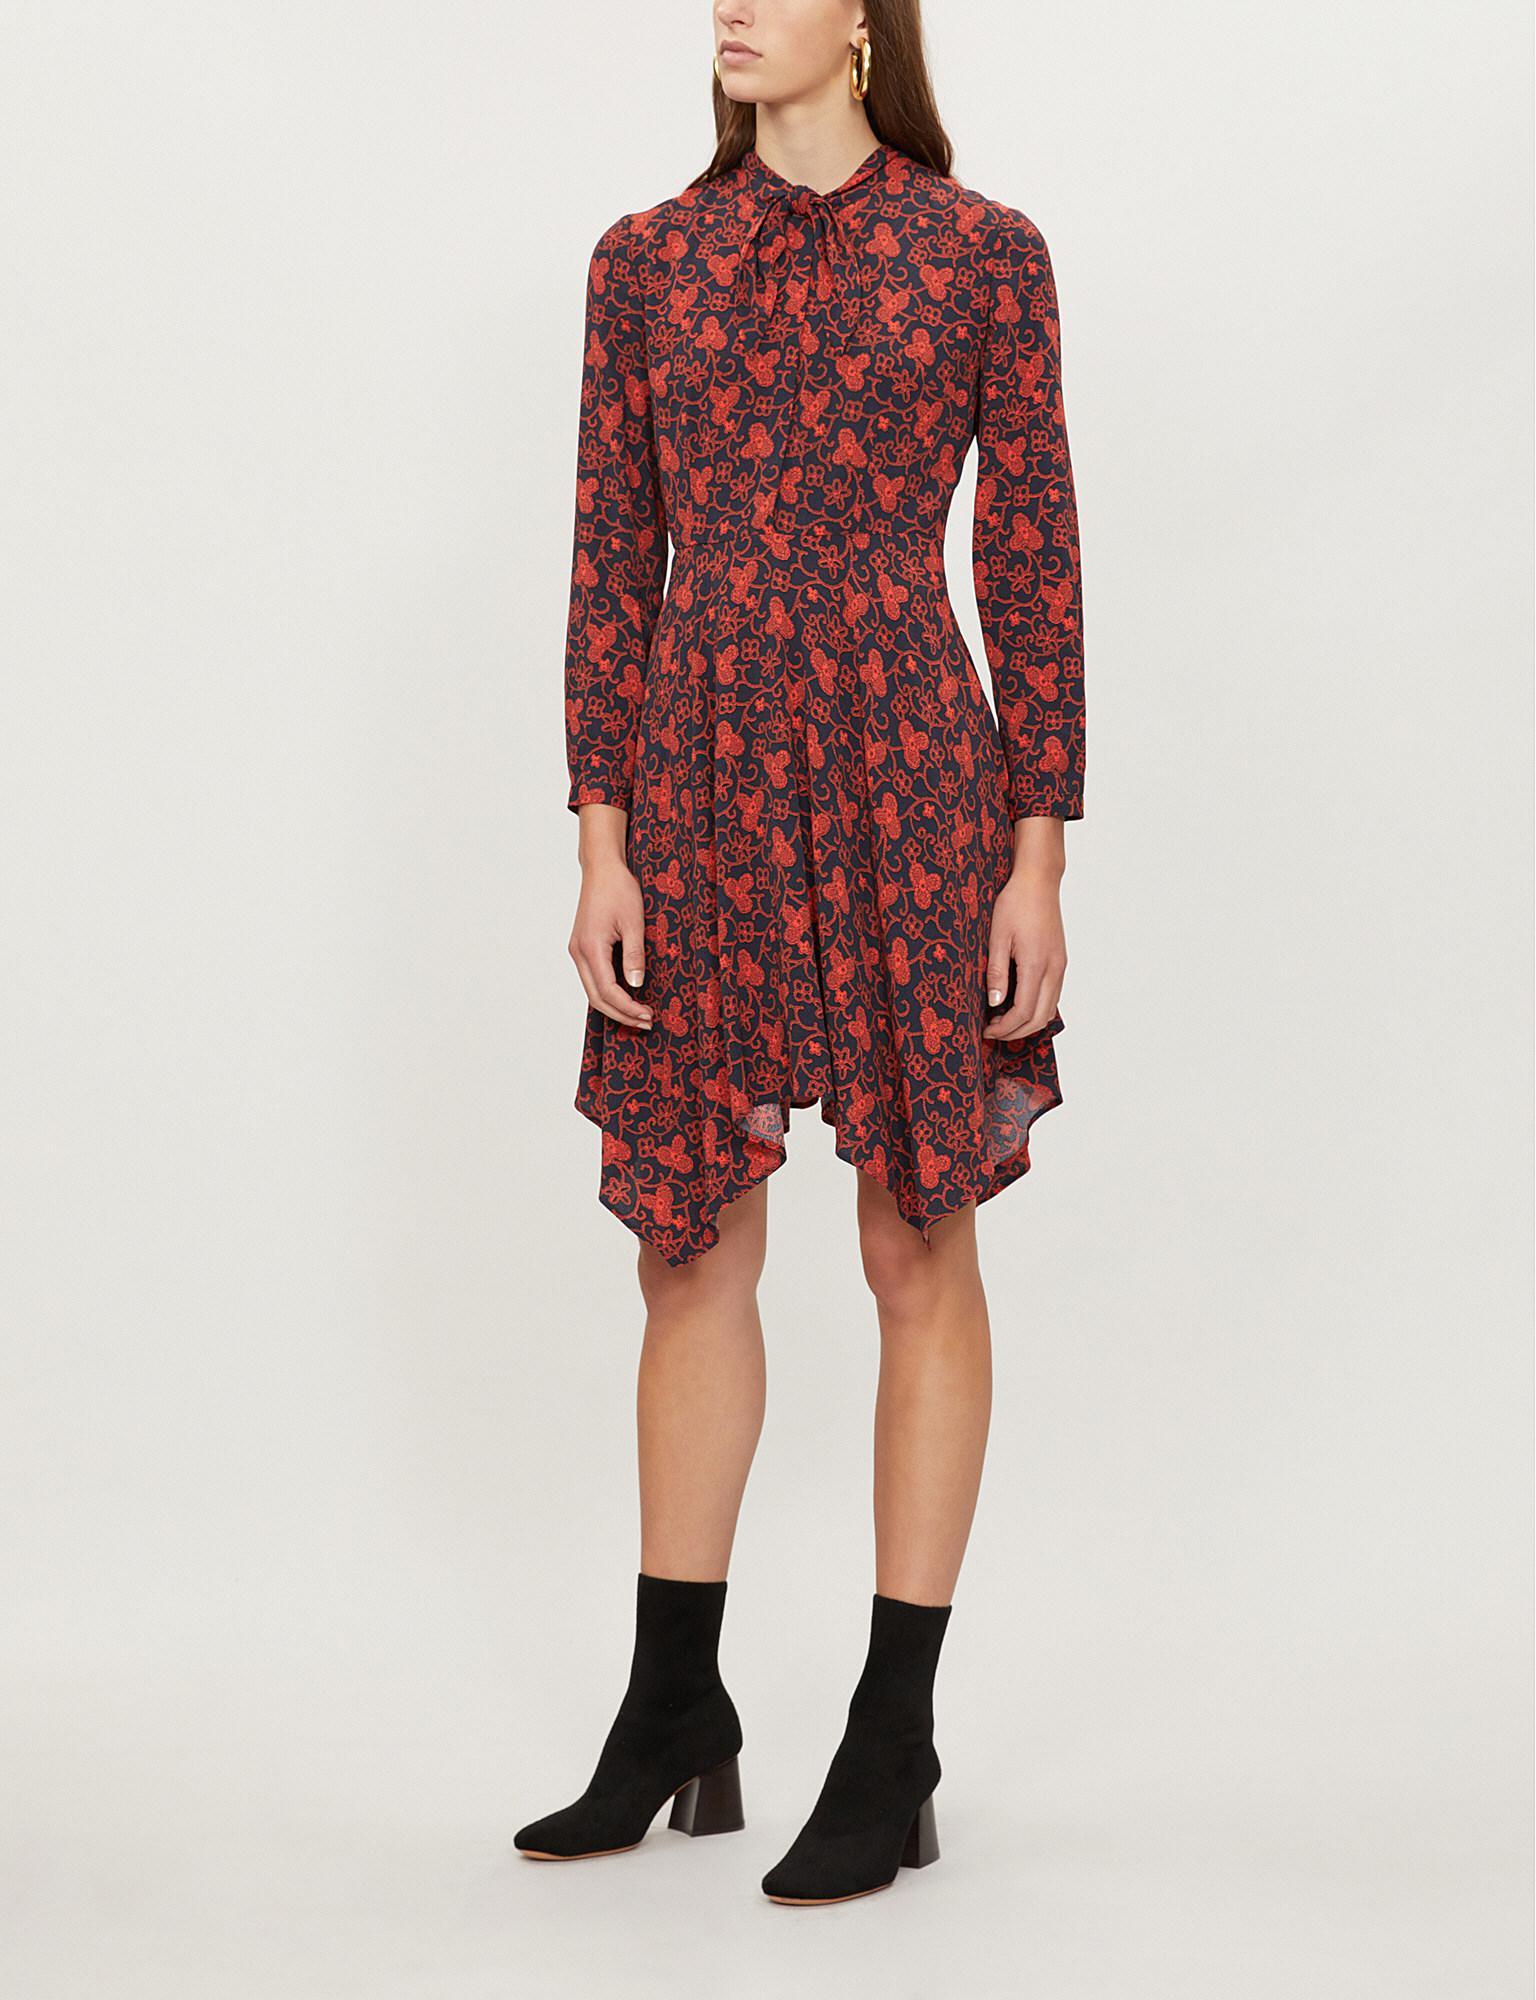 Pierlot In Lyst Rabelia Crepe Neck Red Dress Tie Claudie Floral Print fwSqzq75x